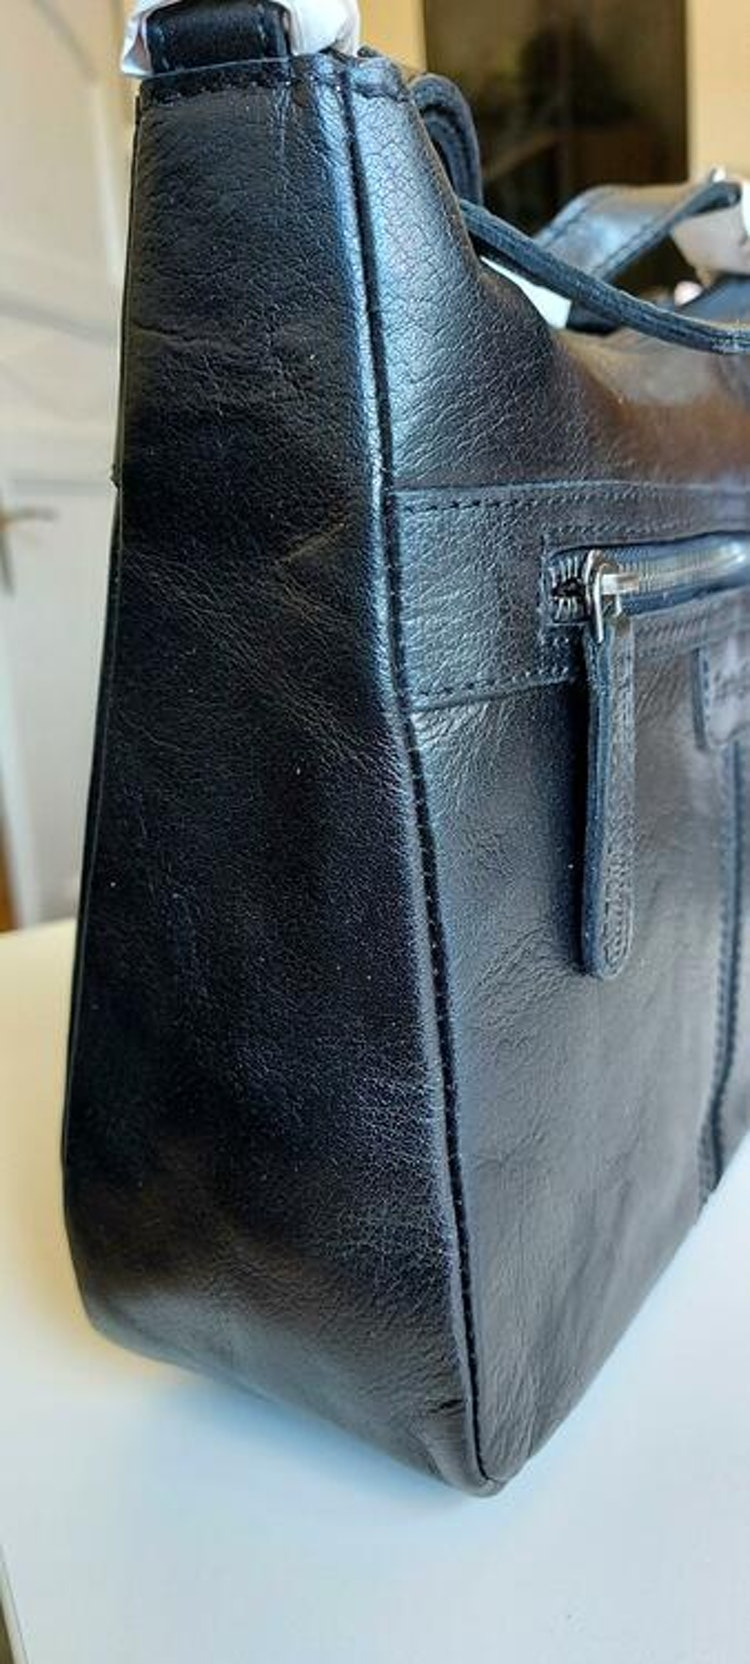 Läderväska svart skinn Springfield 185